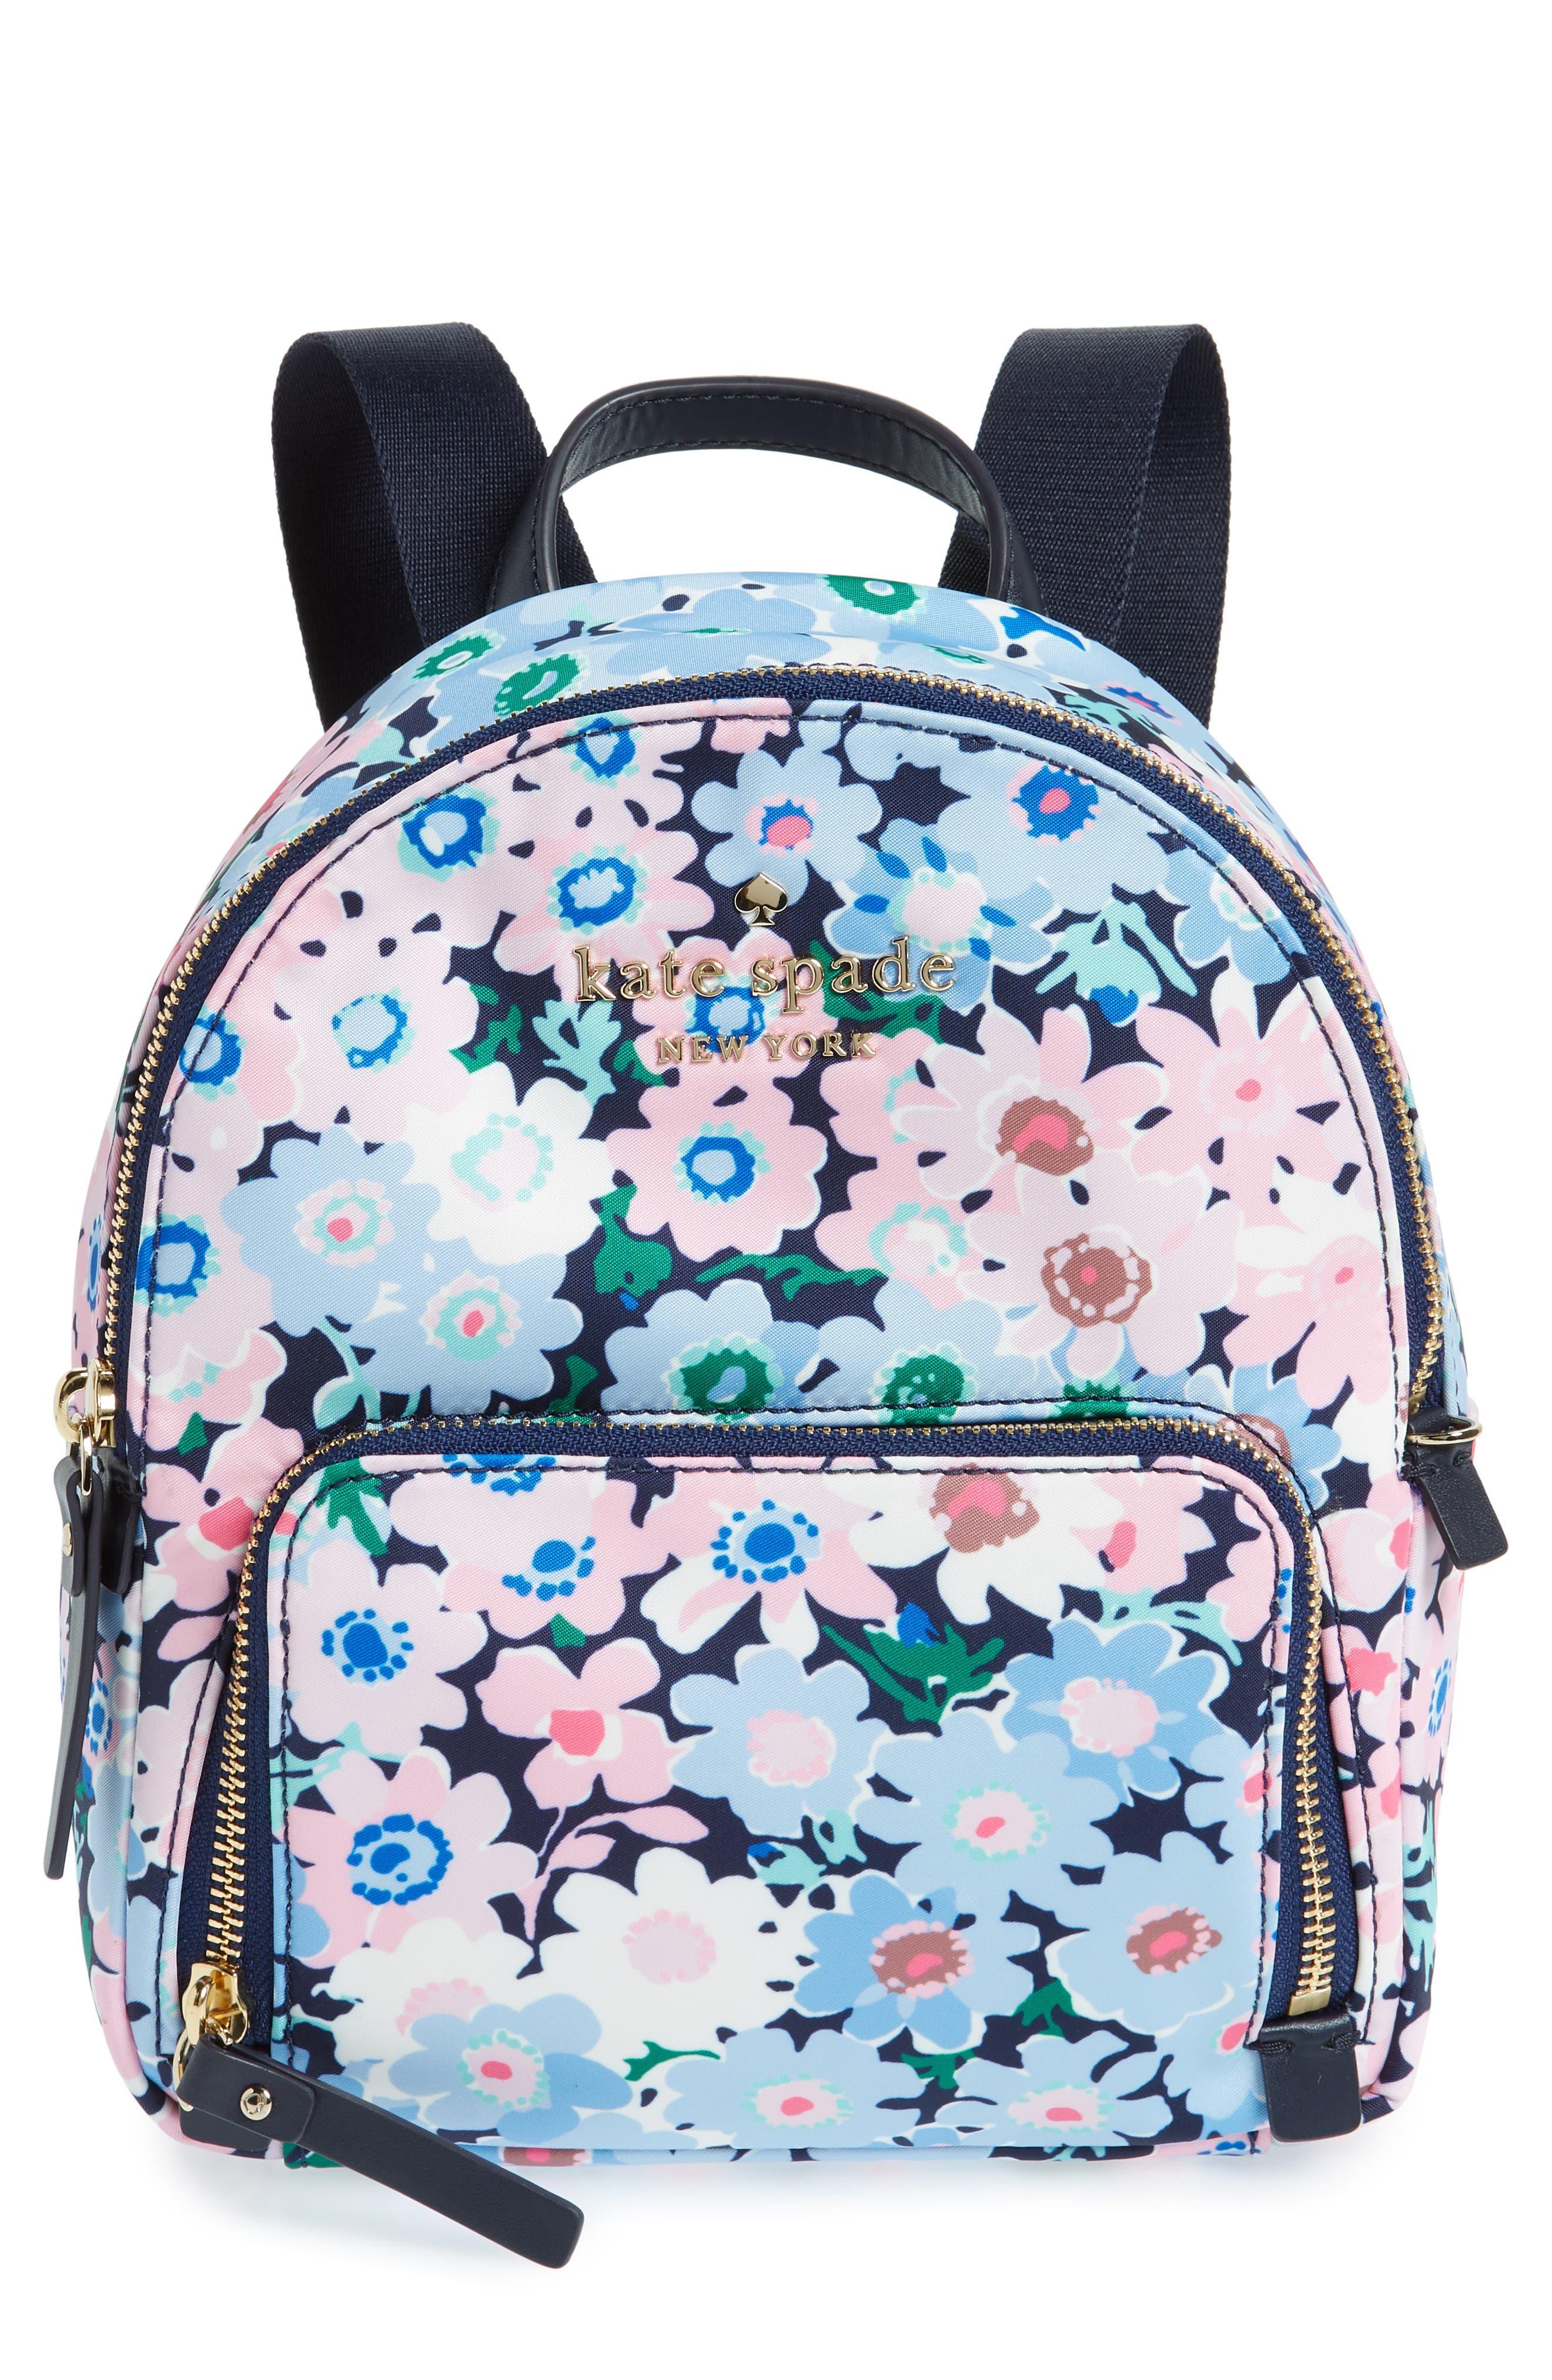 watson lane - daisy garden small hartley backpack,                         Main,                         color, 400